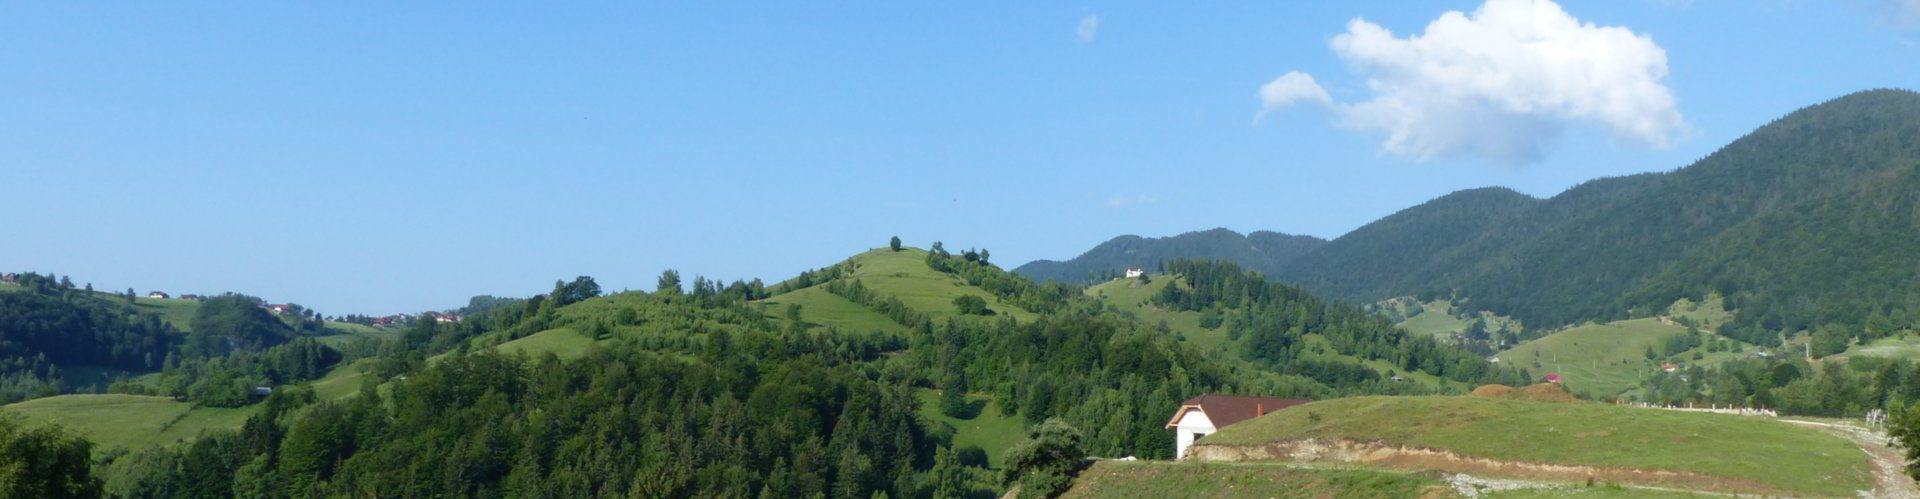 Magura-Romania-Laurie-Jackson